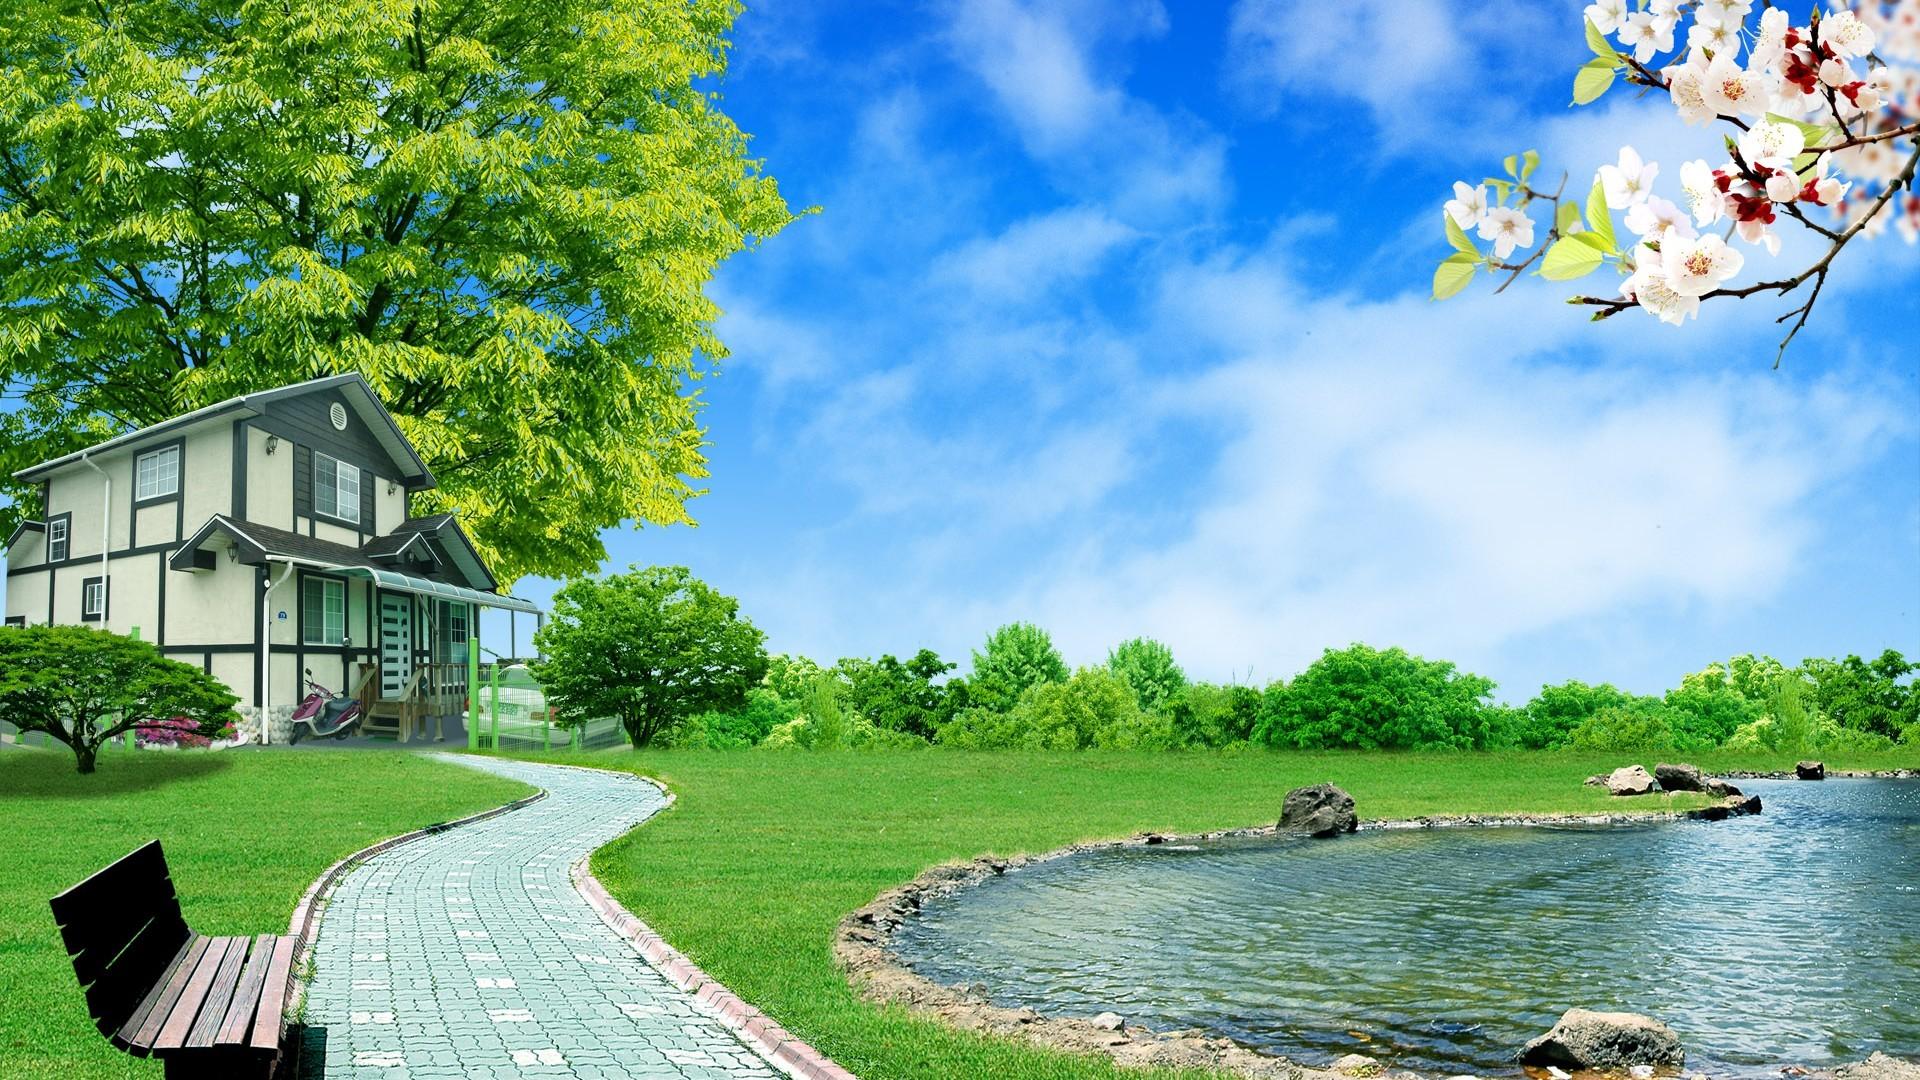 3D Nature Images Free Download | PixelsTalk Net